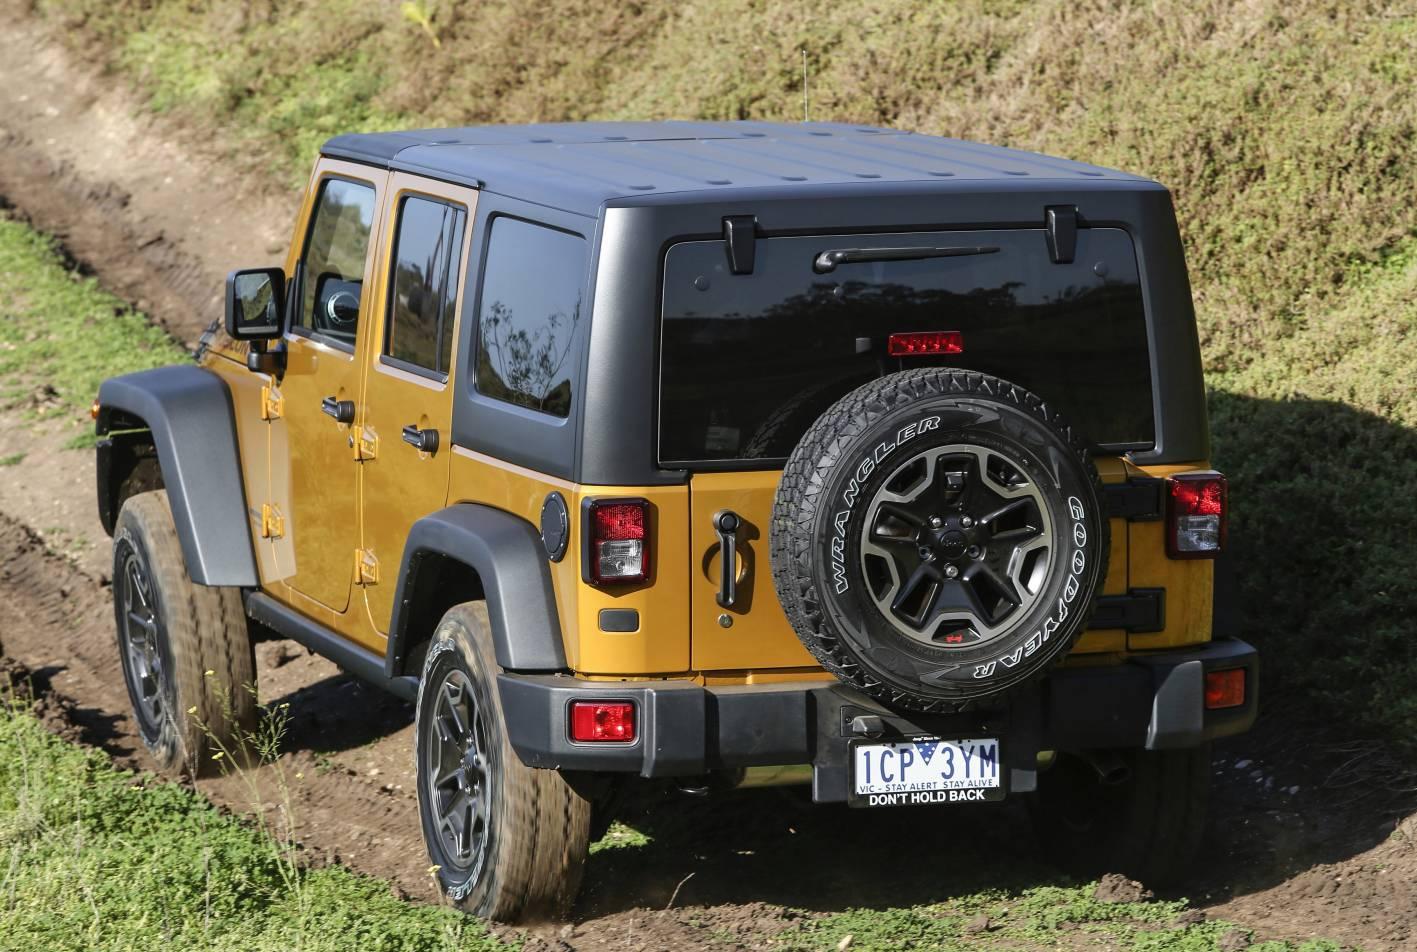 jeep wrangler rubicon x on sale in australia from 52 000 performancedrive. Black Bedroom Furniture Sets. Home Design Ideas